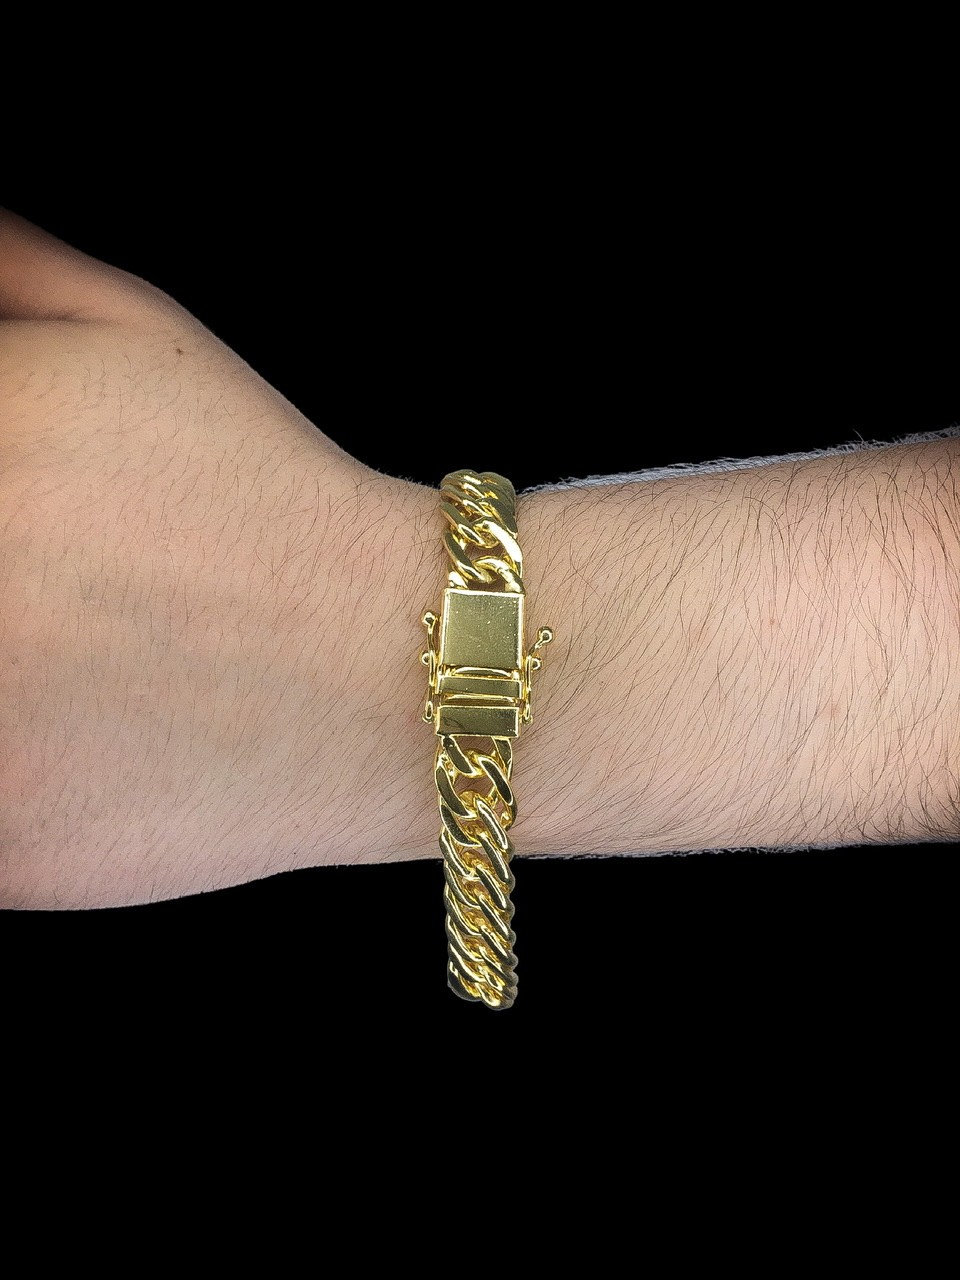 Pulseira Grumet dupla -  10  milímetros - 22 Centímetros - fecho gaveta trava dupla - Banhado a ouro 18 k